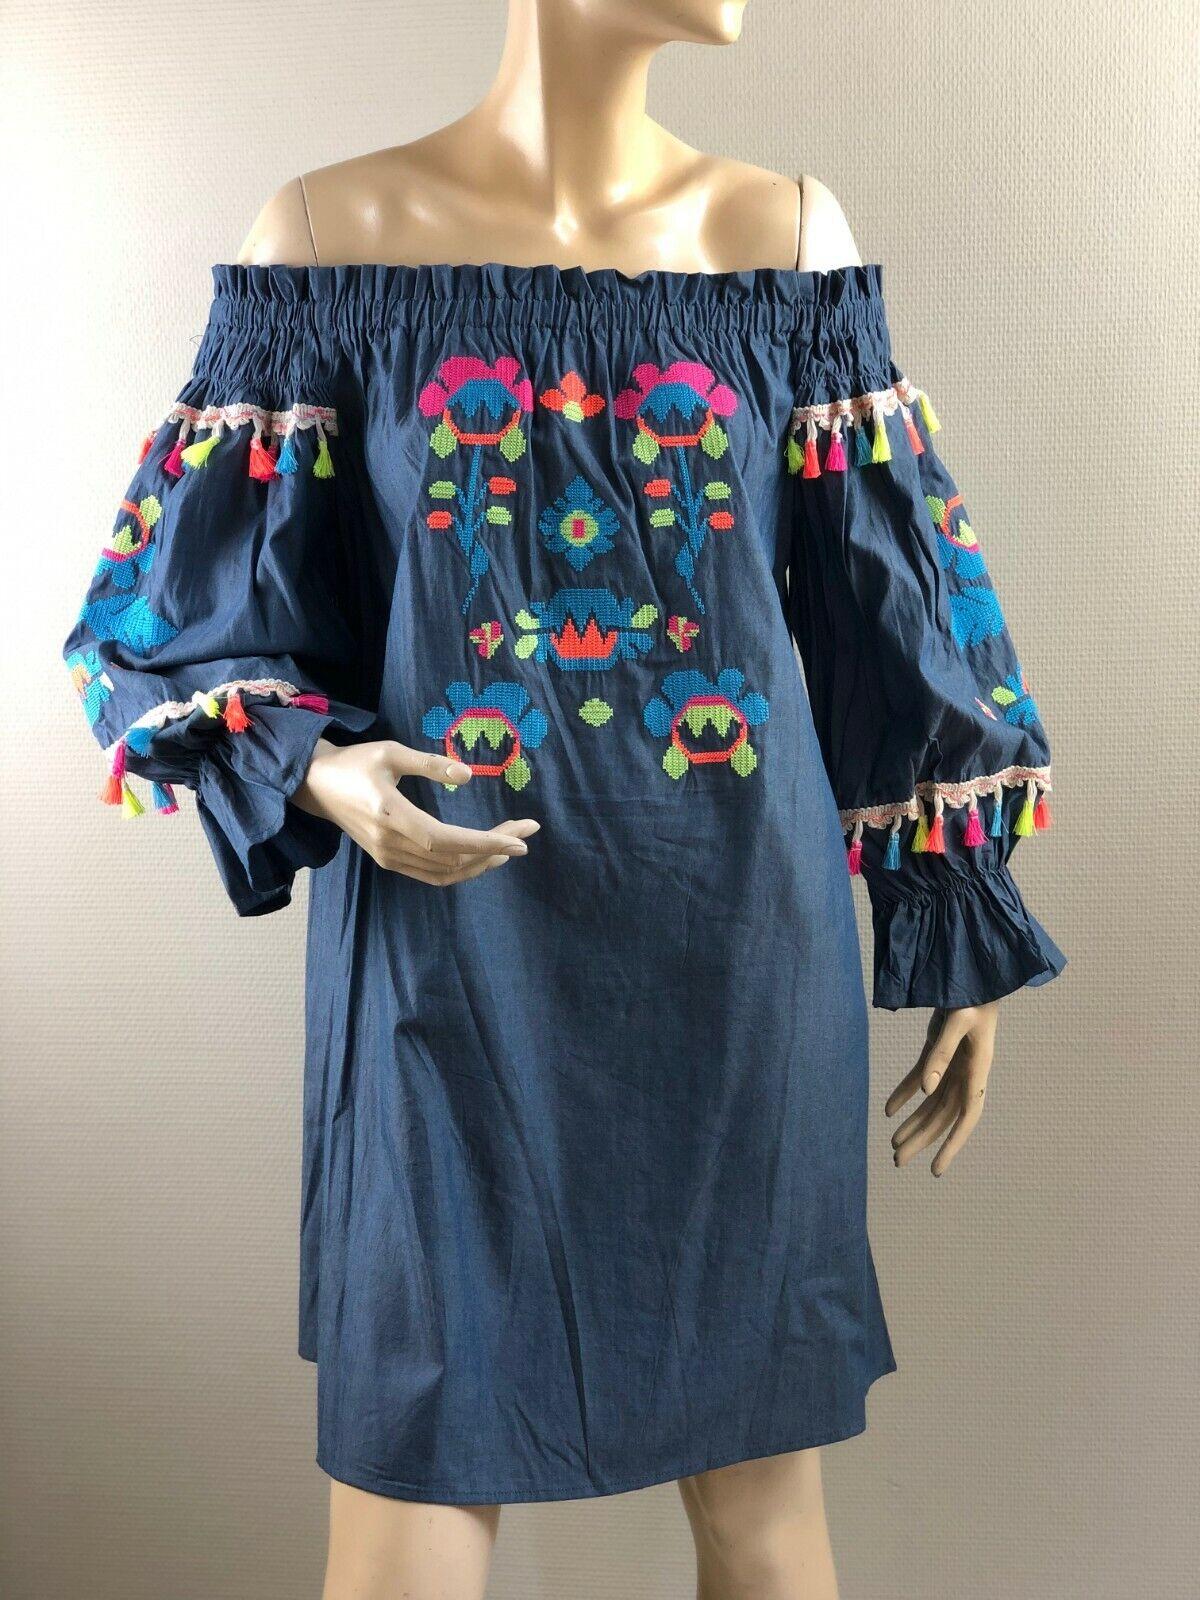 Wiya jeans blau Tunika Carmen Kleid Stickerei Quasten Hippie S M Look